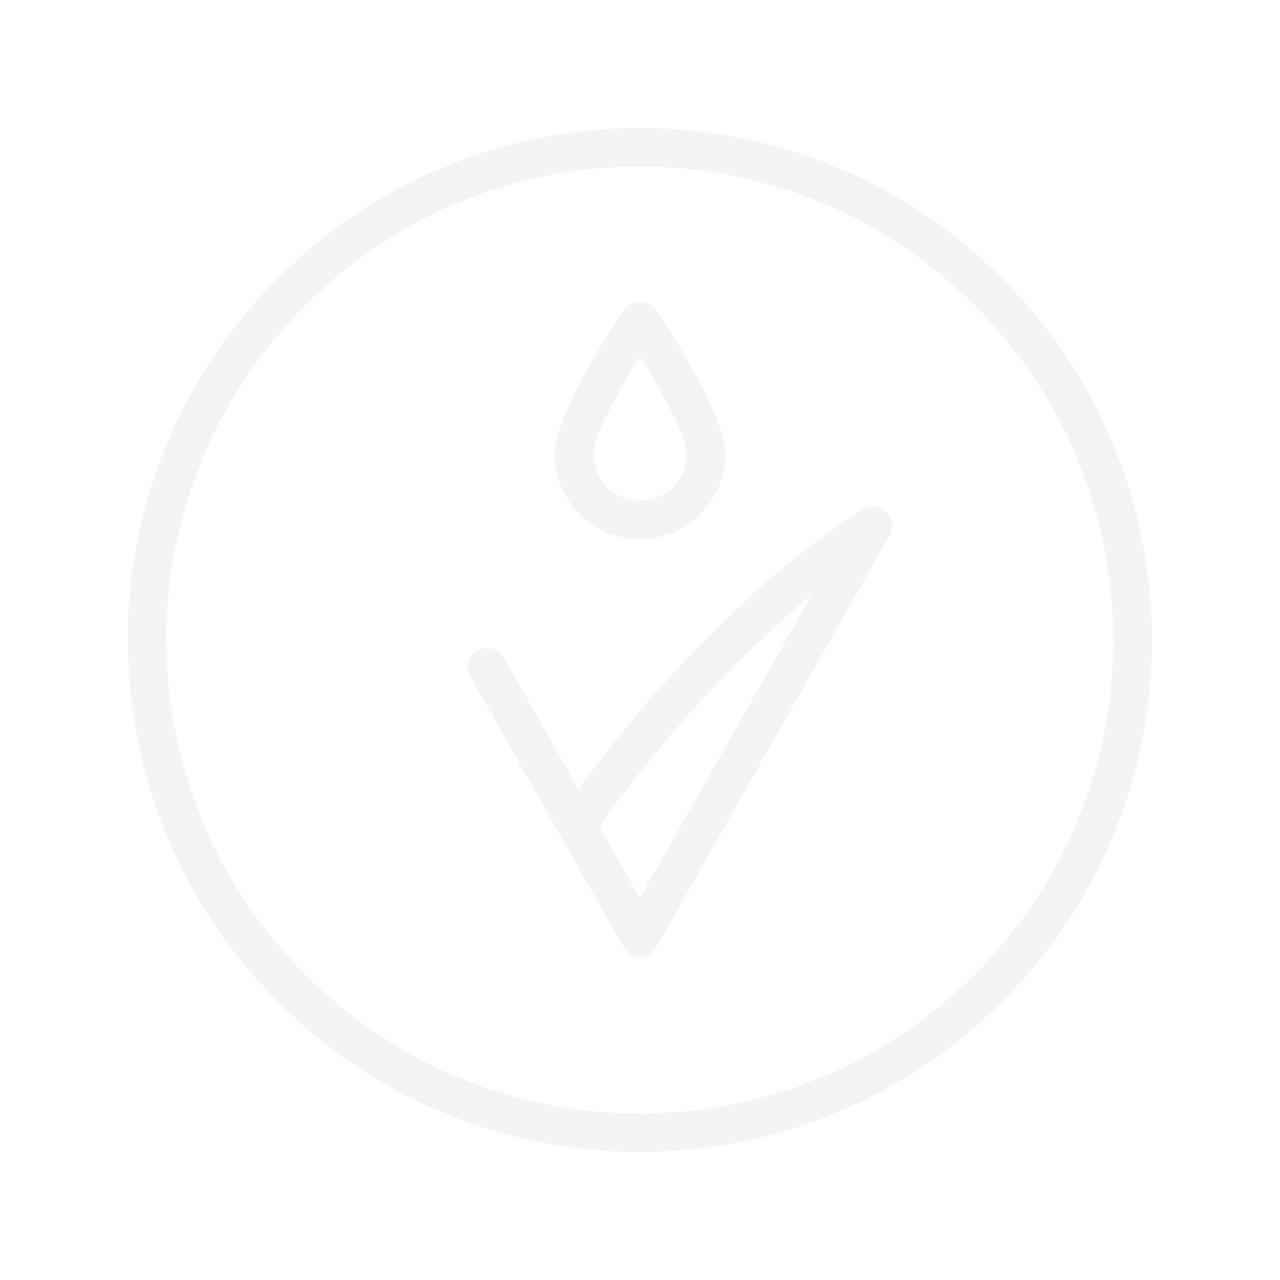 SWISSDENT Profi Colours Toothbrush Trio (White/Pink/Brown)